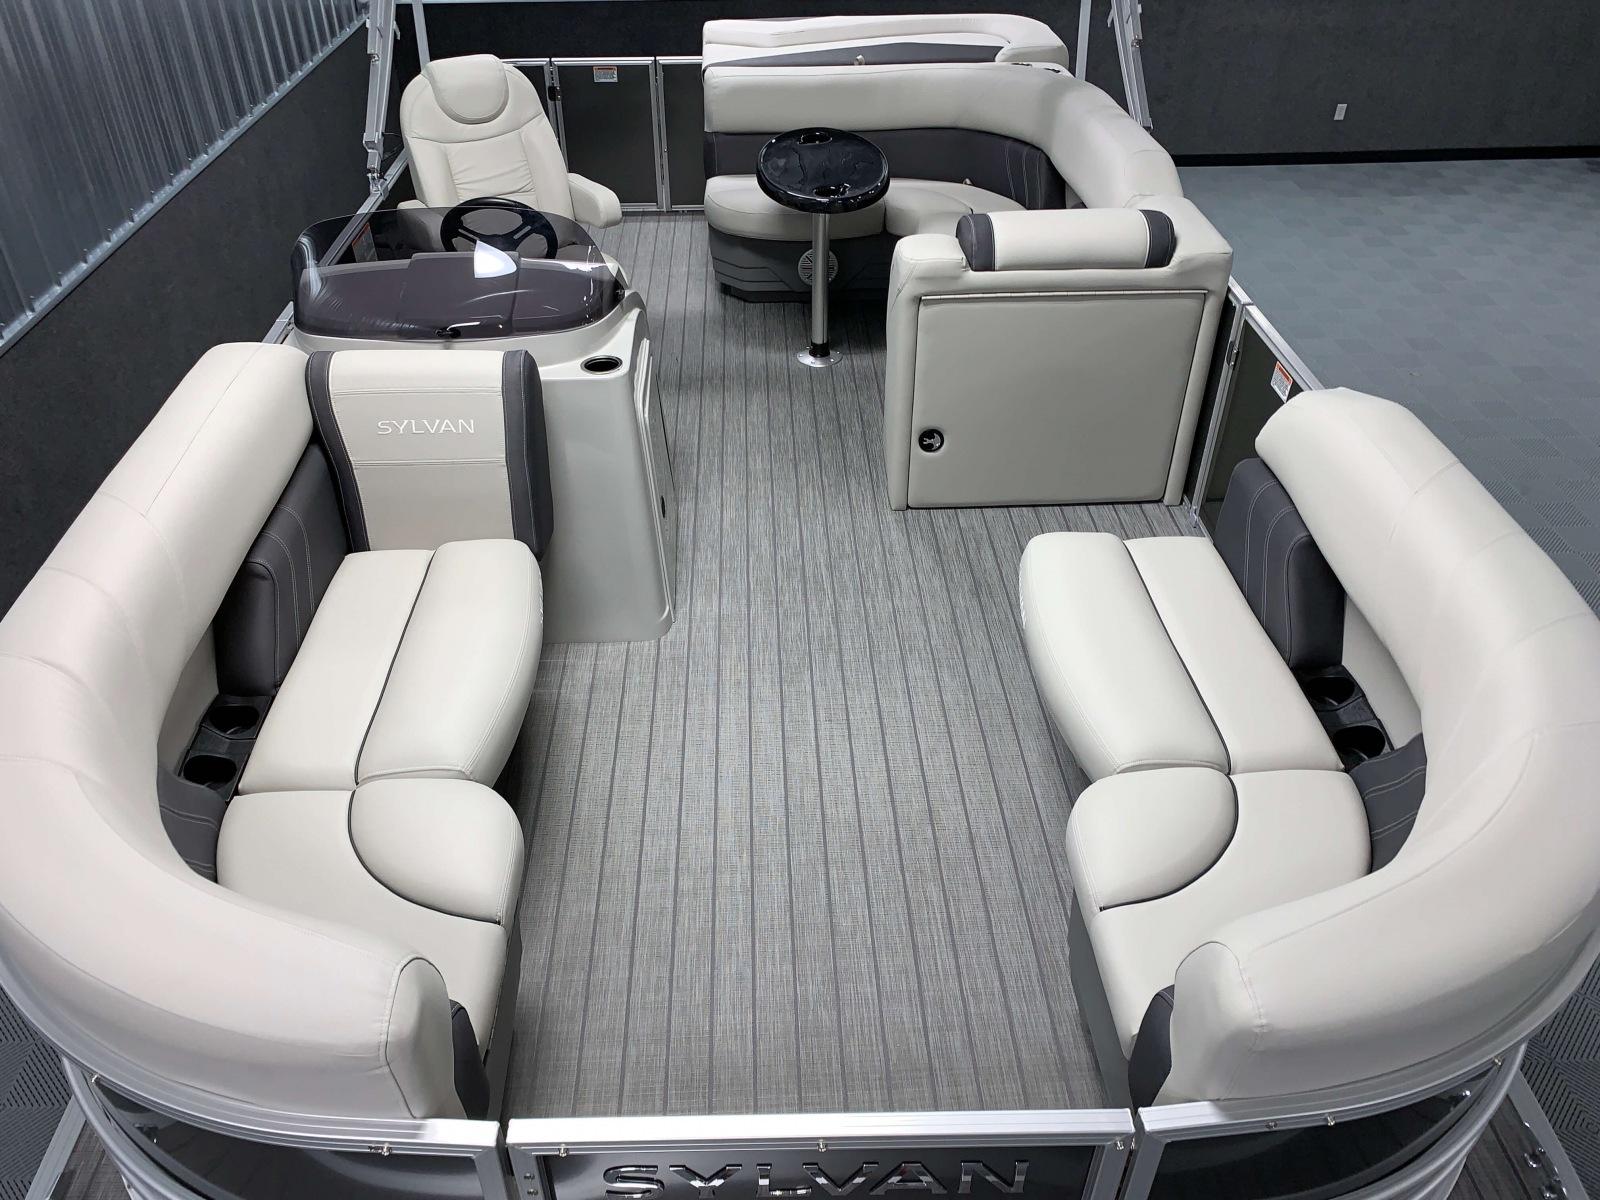 Interior Layout of a 2020 Sylvan Mirage 8520 Cruise Tritoon 1